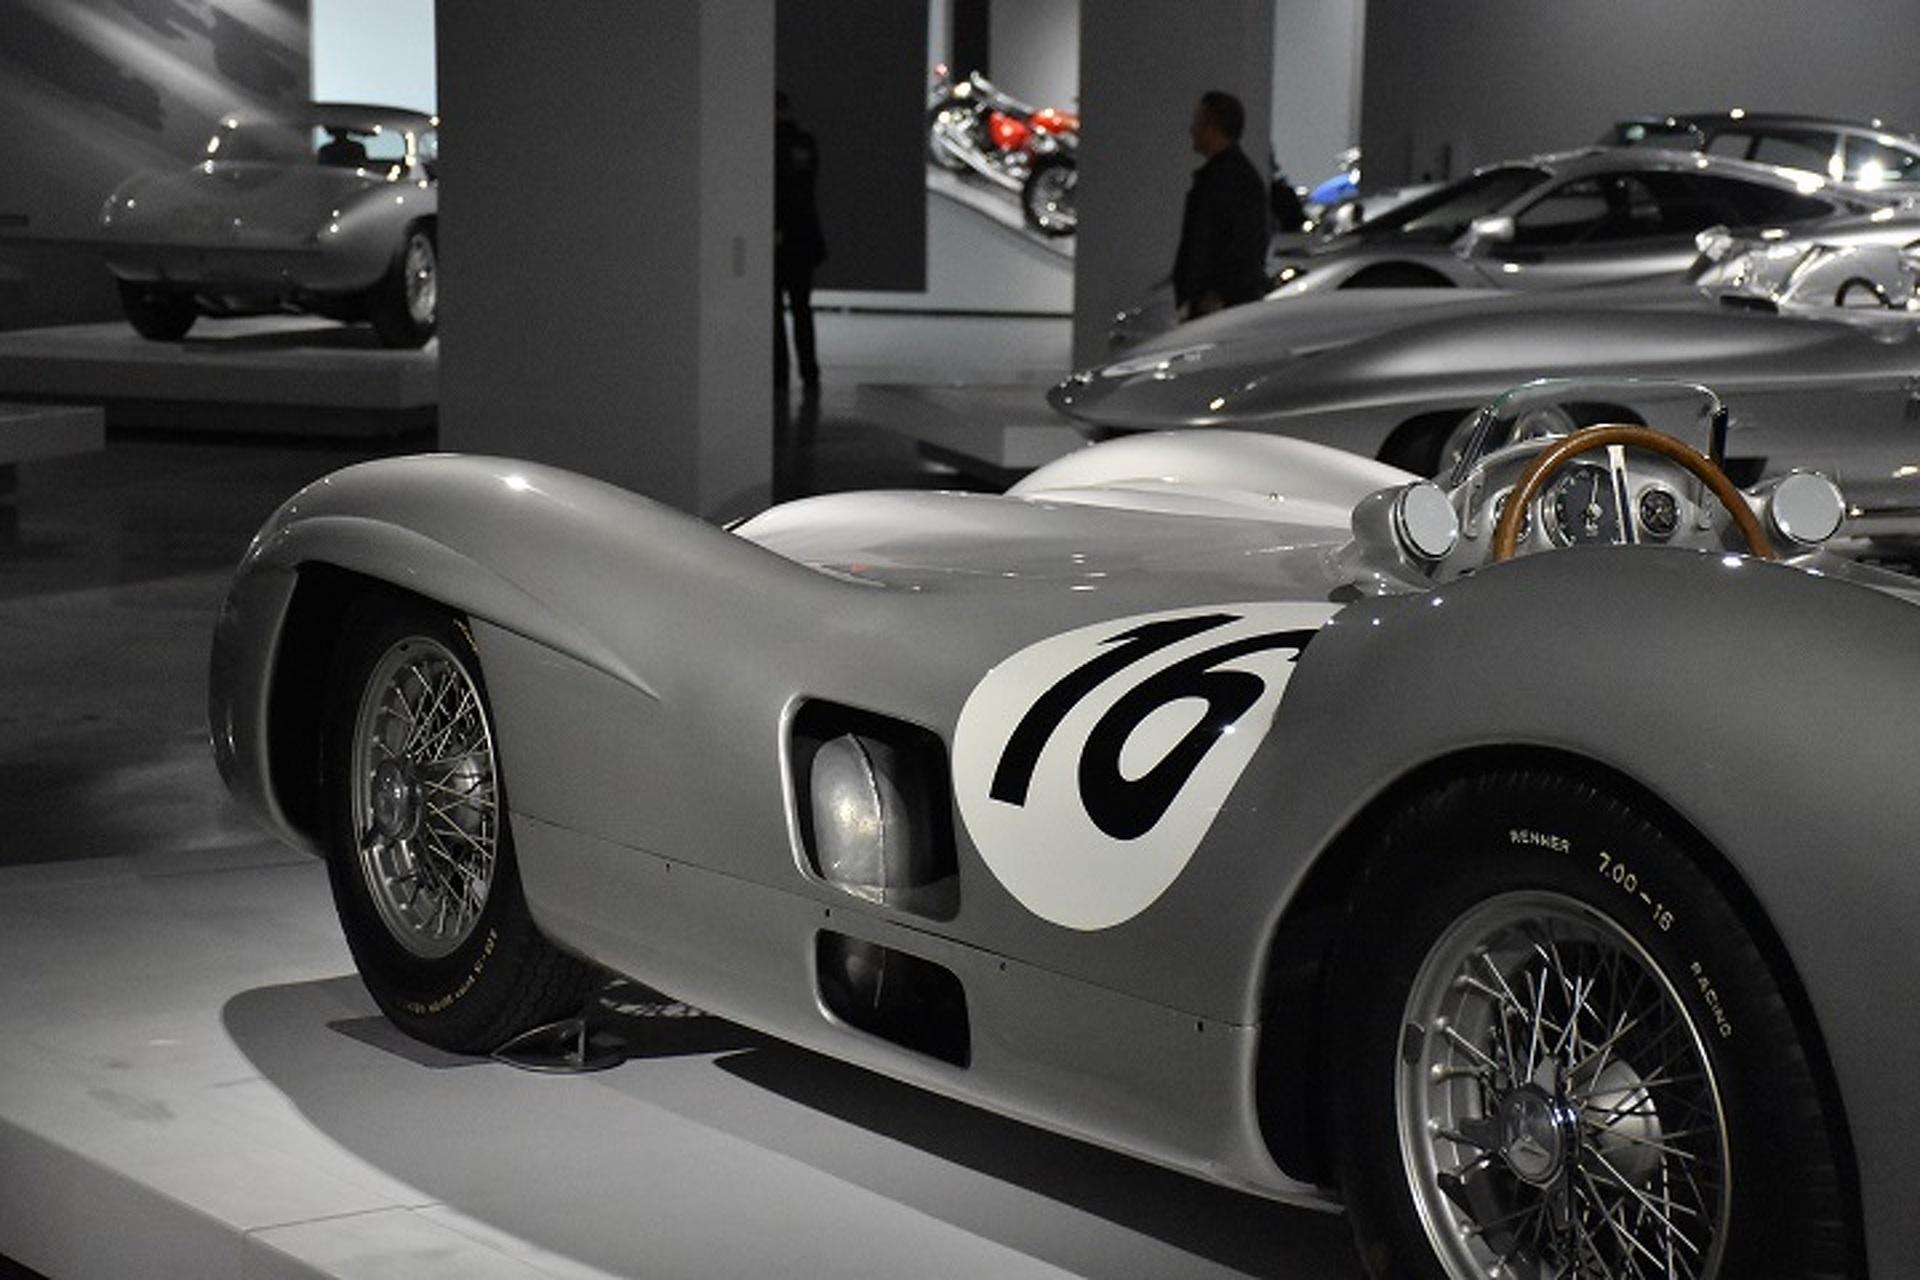 Art Deco to Art Morrison: Inside the Petersen Automotive Museum